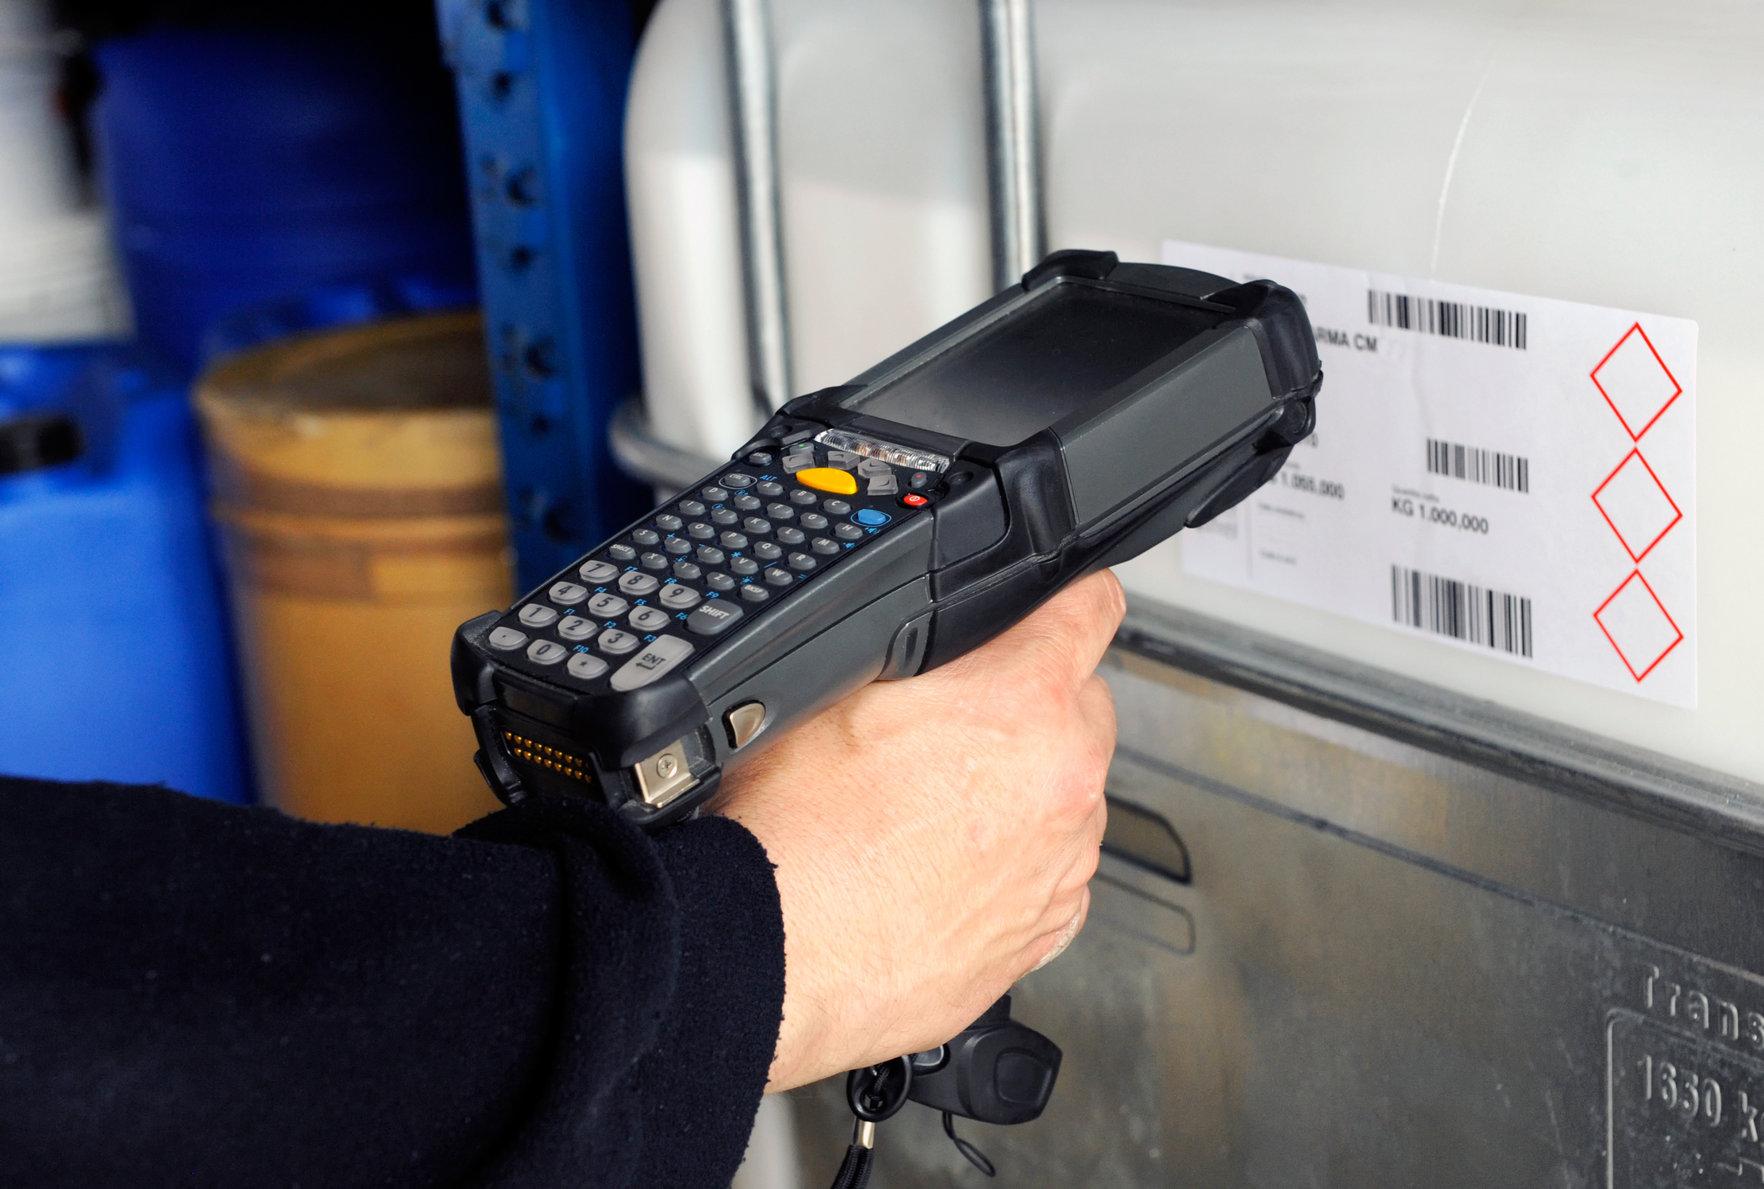 barcode-scanner-barcode-repairs-refurbished-barcode